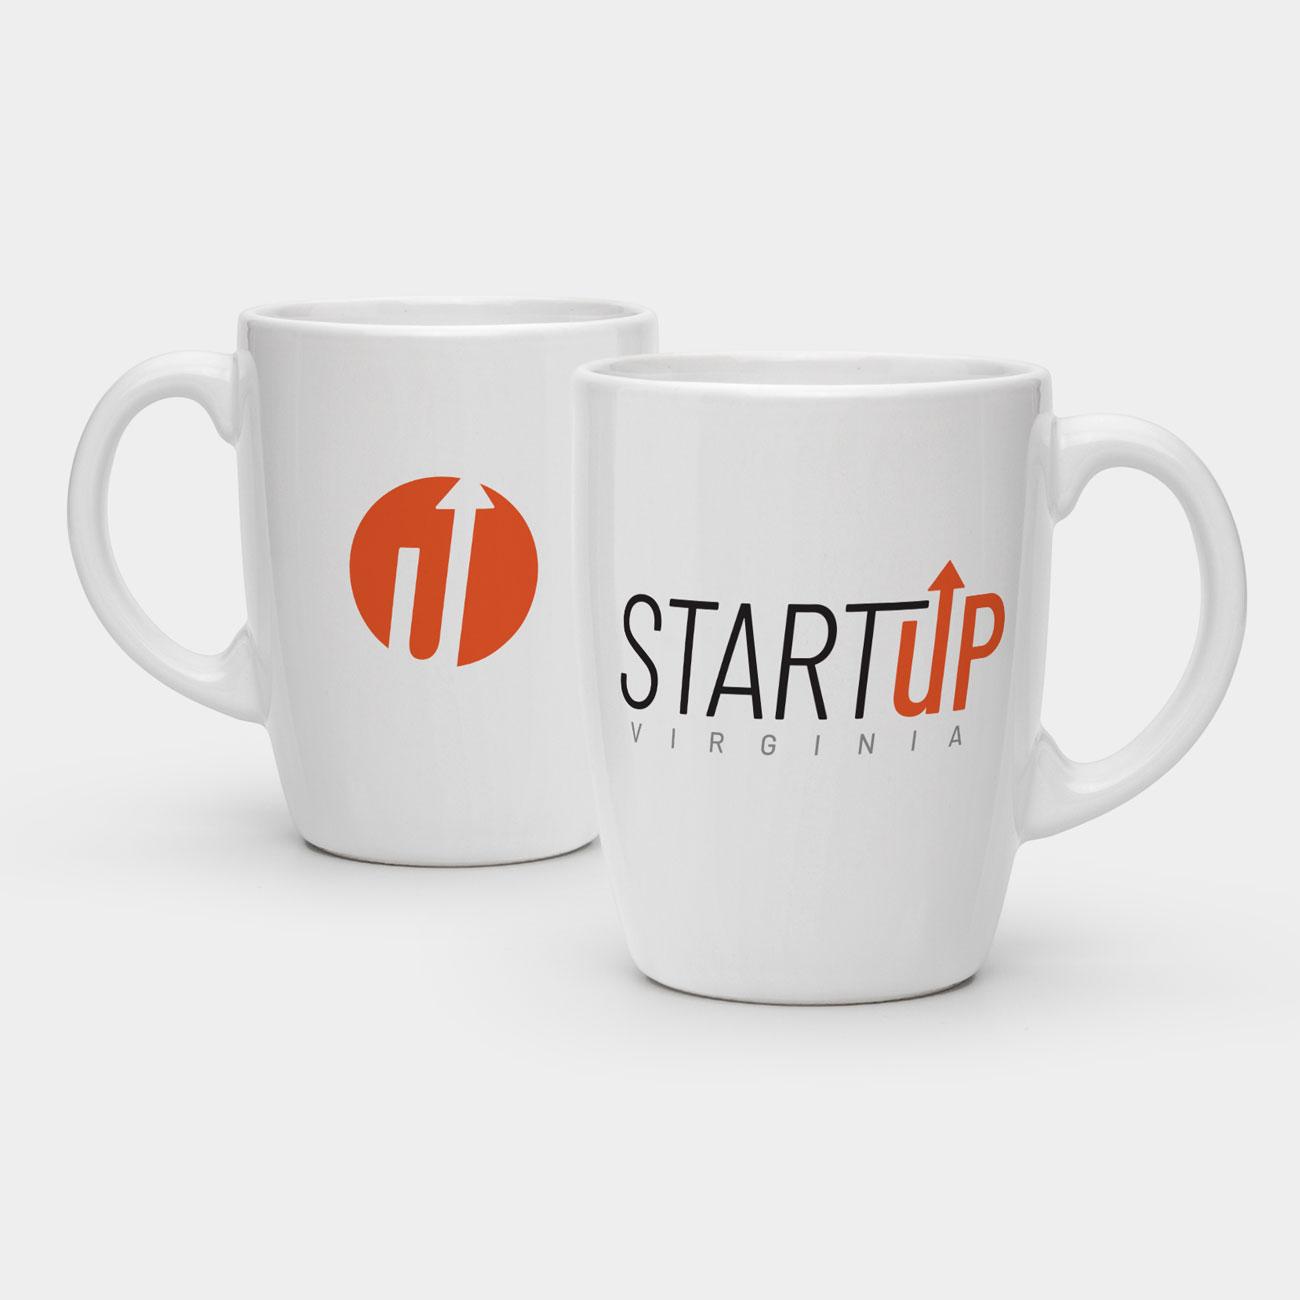 EVERGIB_Startup-Virginia_Coffee-Mugs_SQ_1300